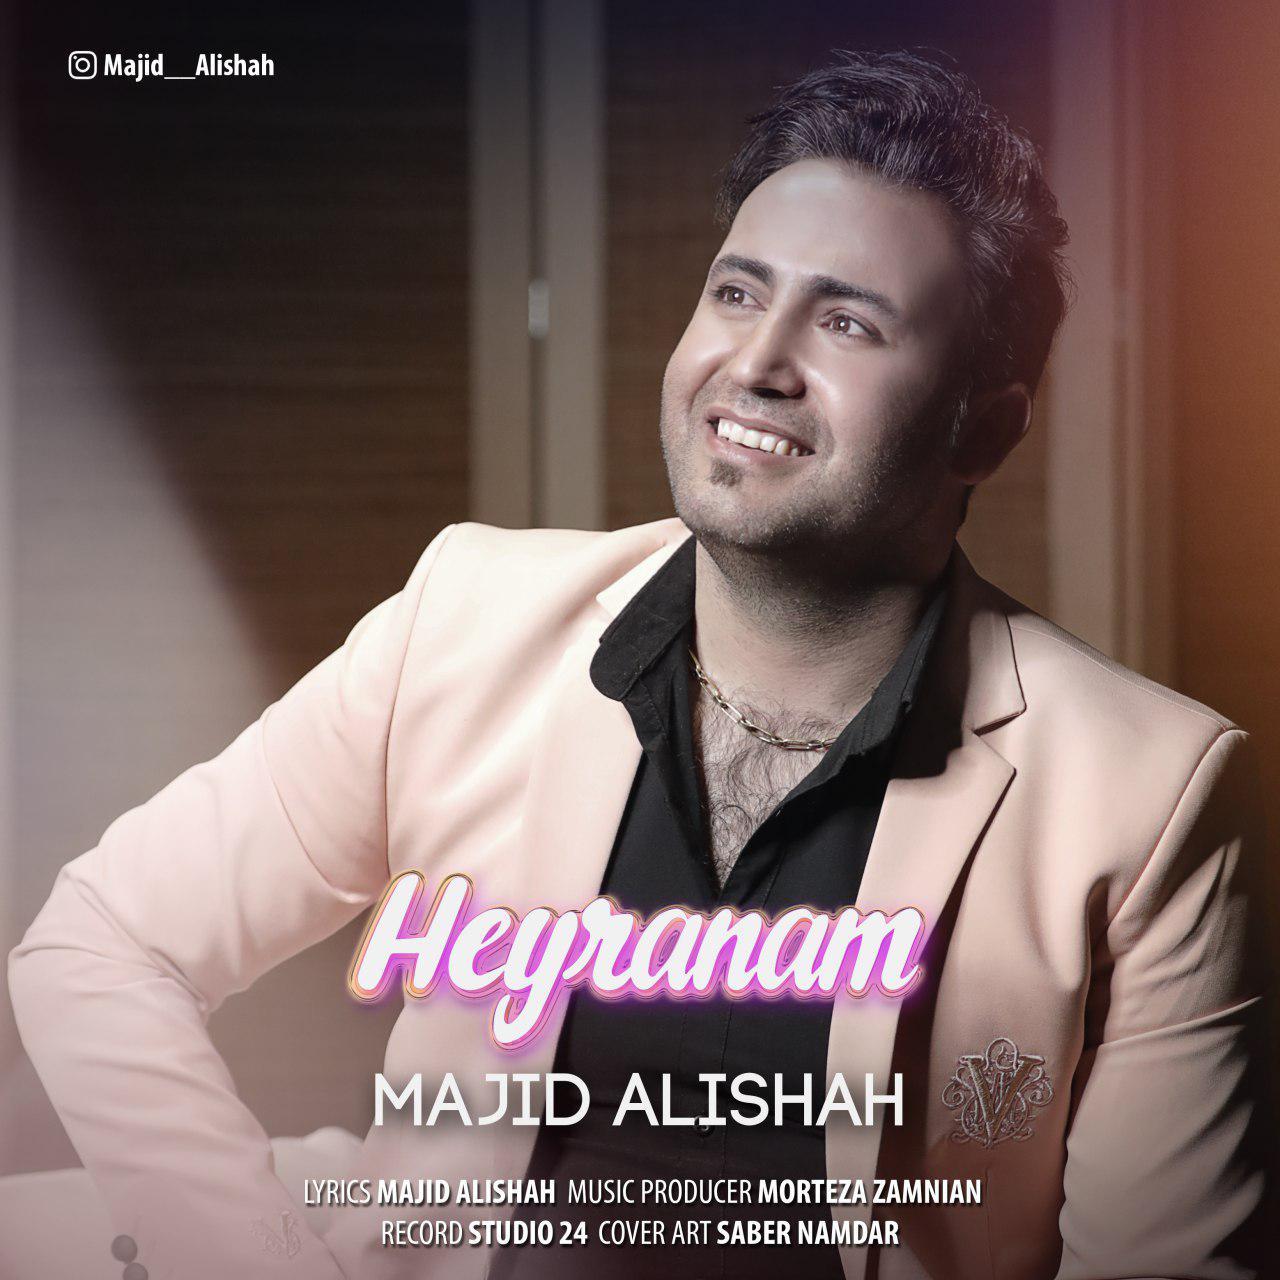 http://s9.picofile.com/file/8357664268/05Majid_Alishah_Heyranam.jpg